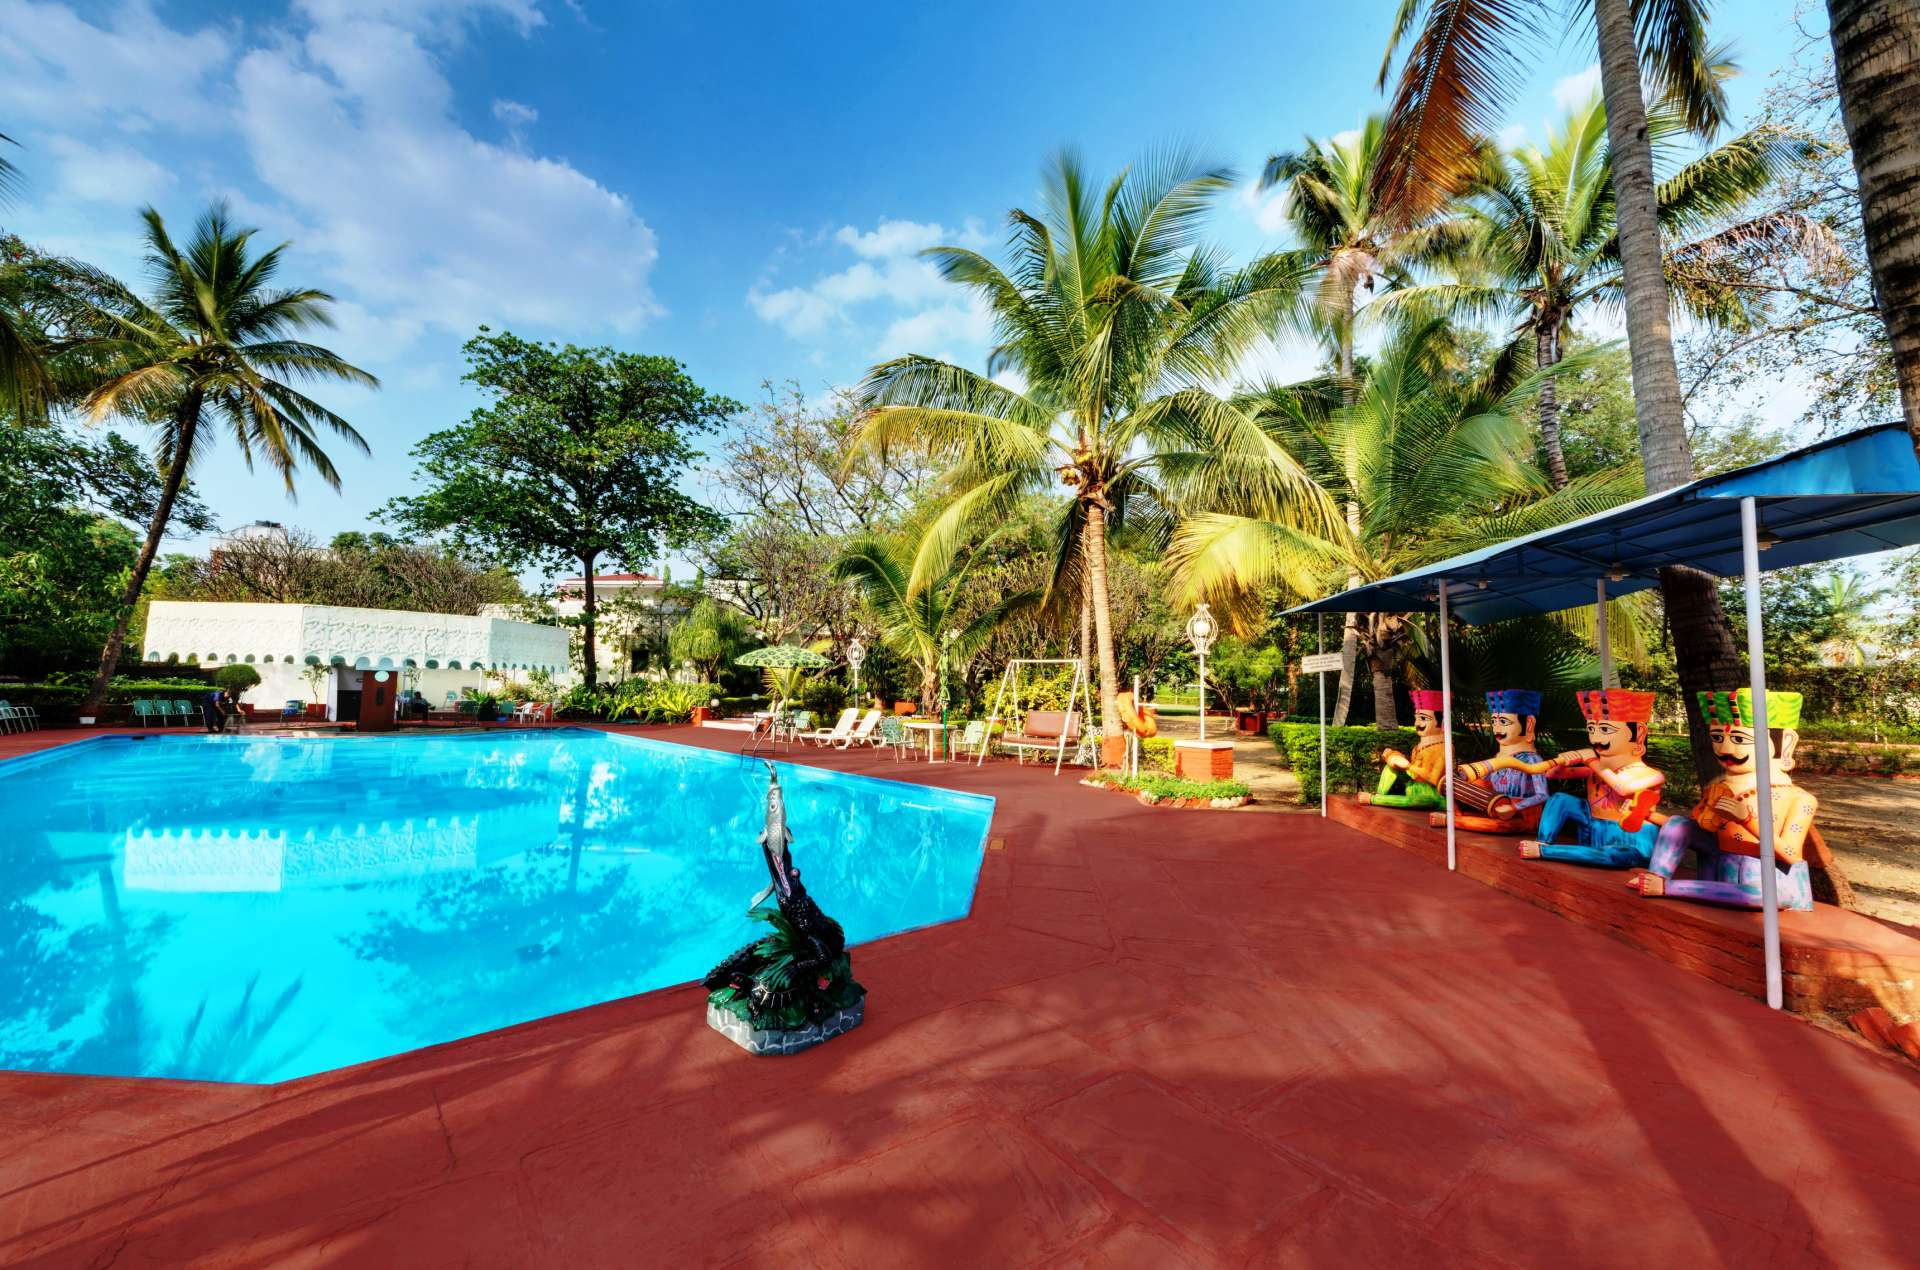 Swimming Pool Aurangabad banner ambassador ajanta - The Ambassador | Heritage Hotels in Mumbai, Aurangabad, Chennai - Ambassador Ajanta Aurangabad